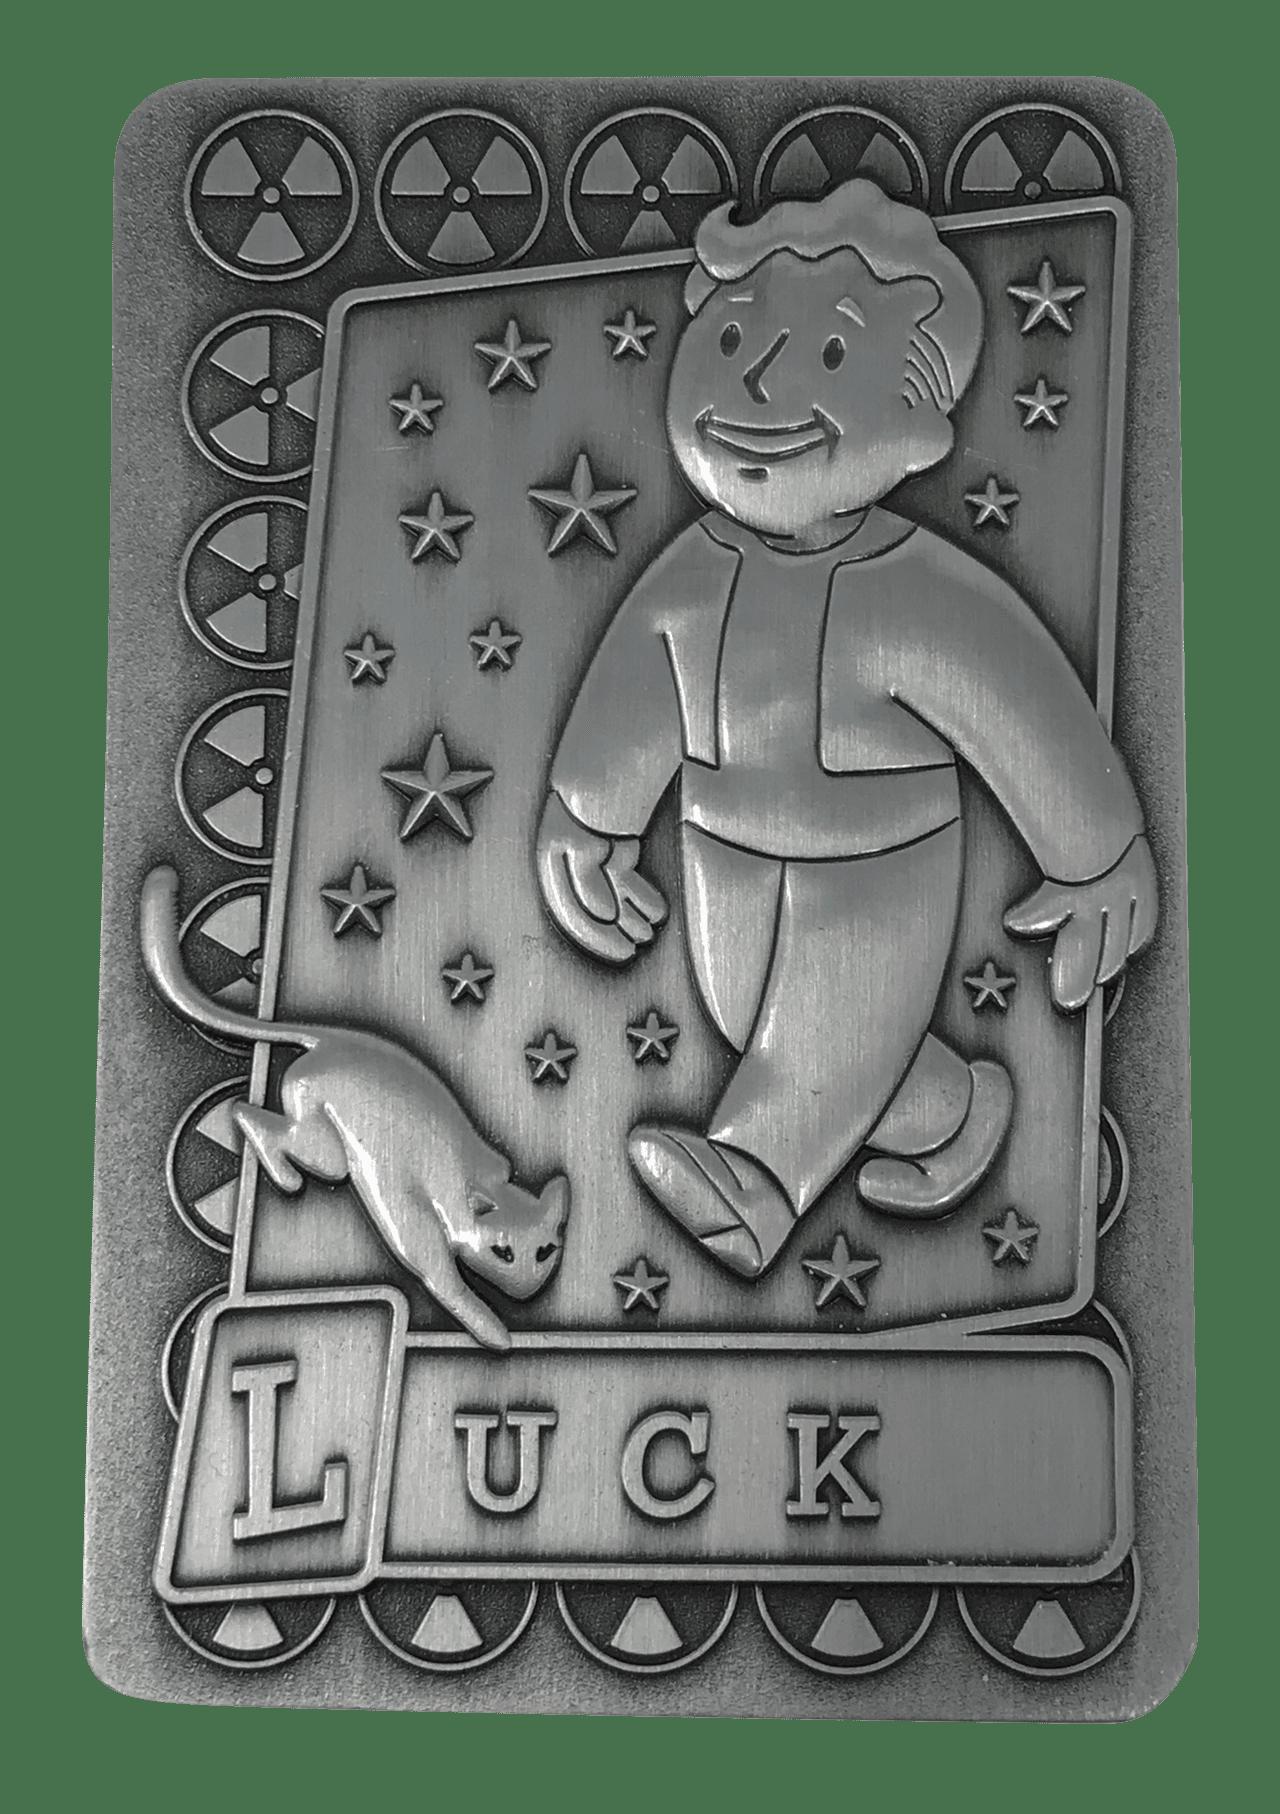 Fallout: Luck Metal Perk Card - 2